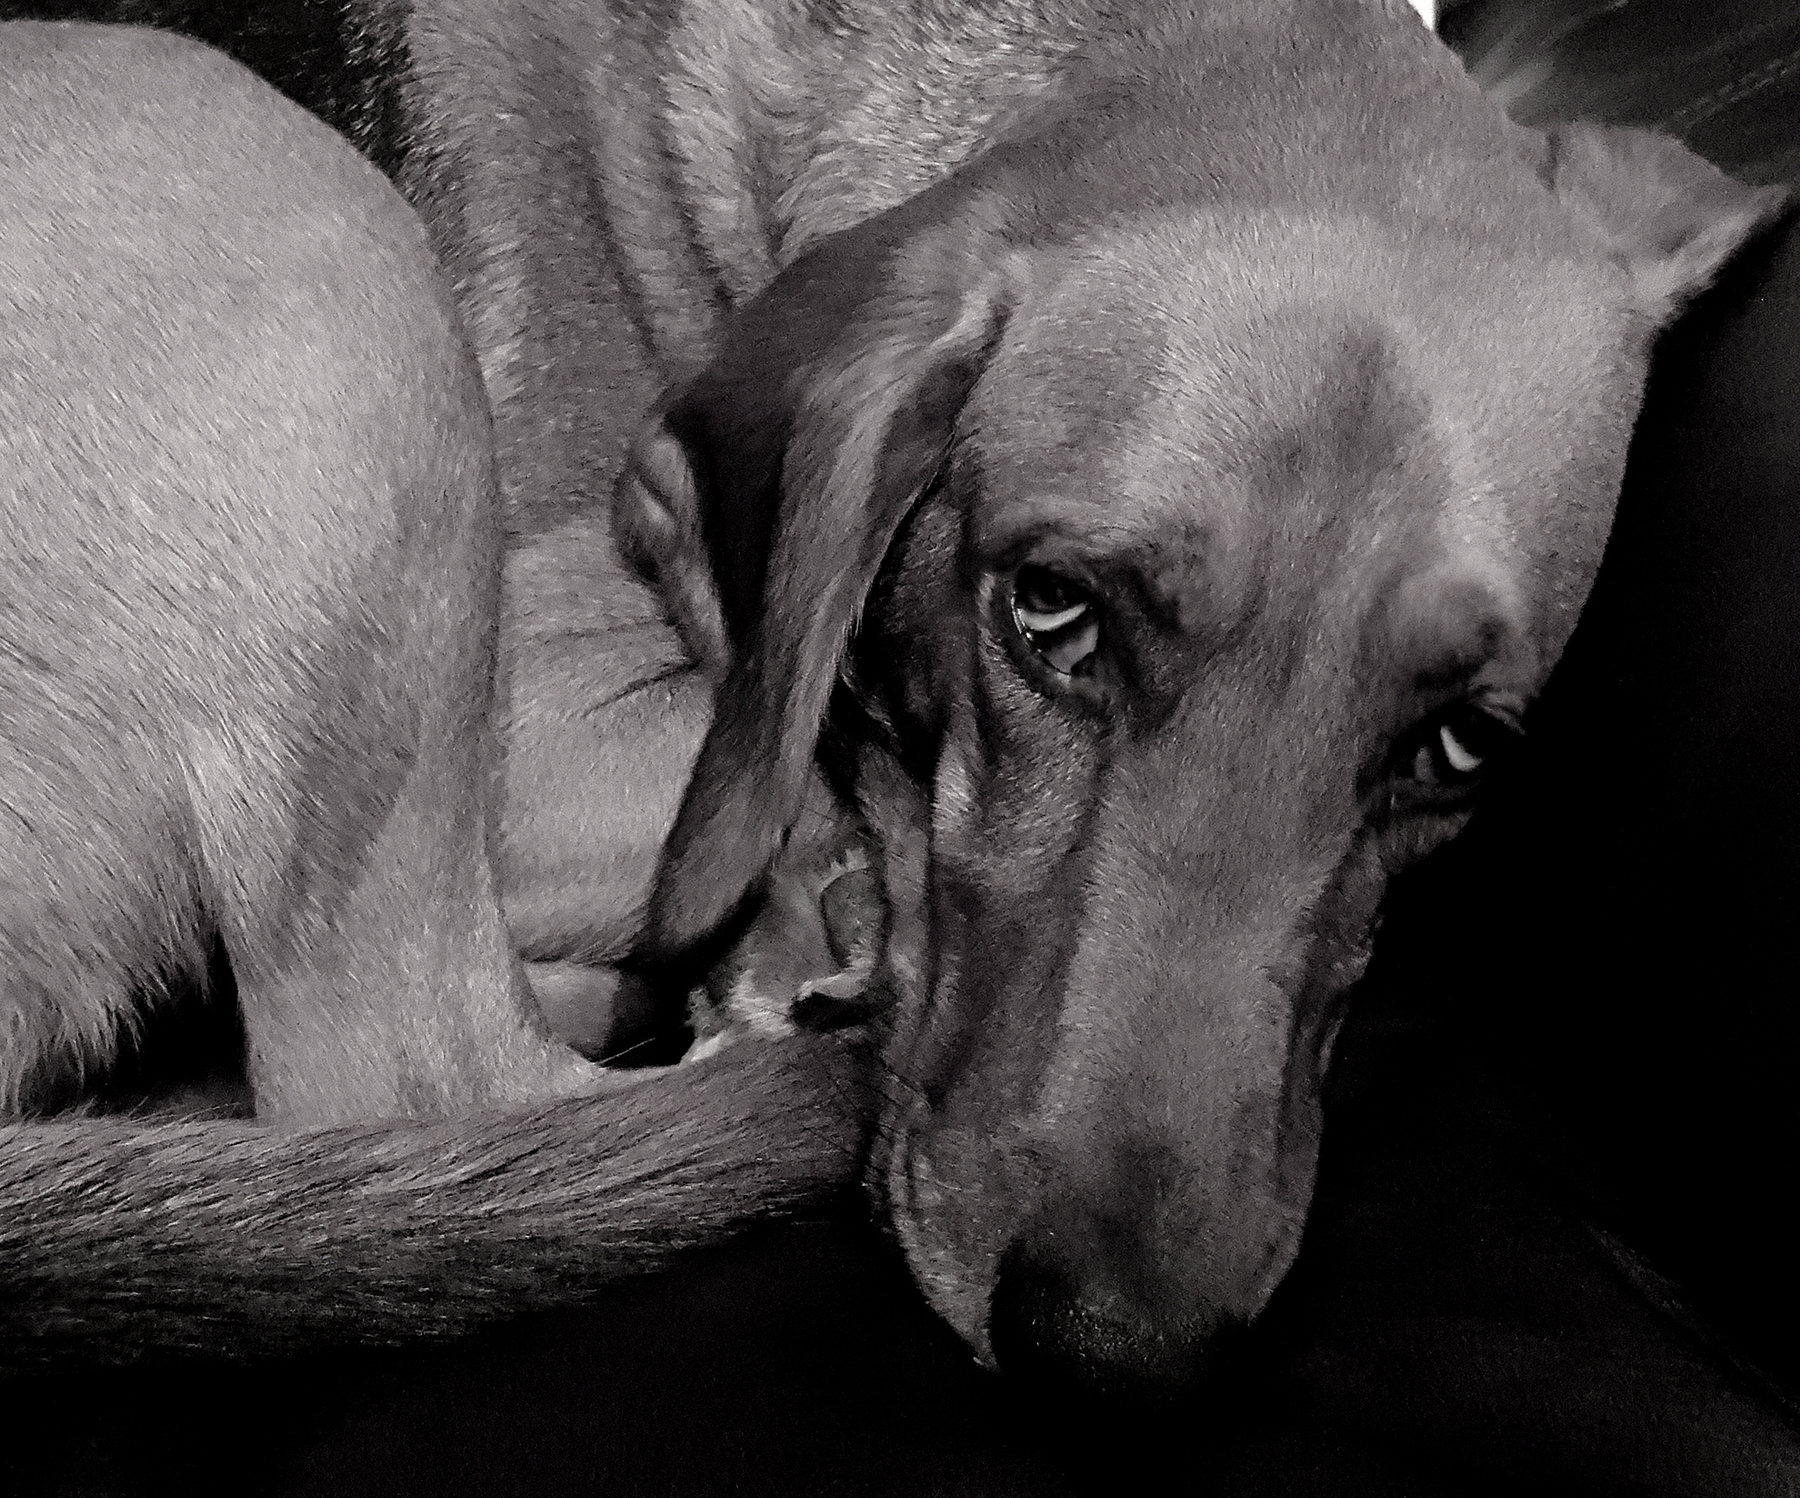 Patty_Tuggle_Blind Coonhound.jpg